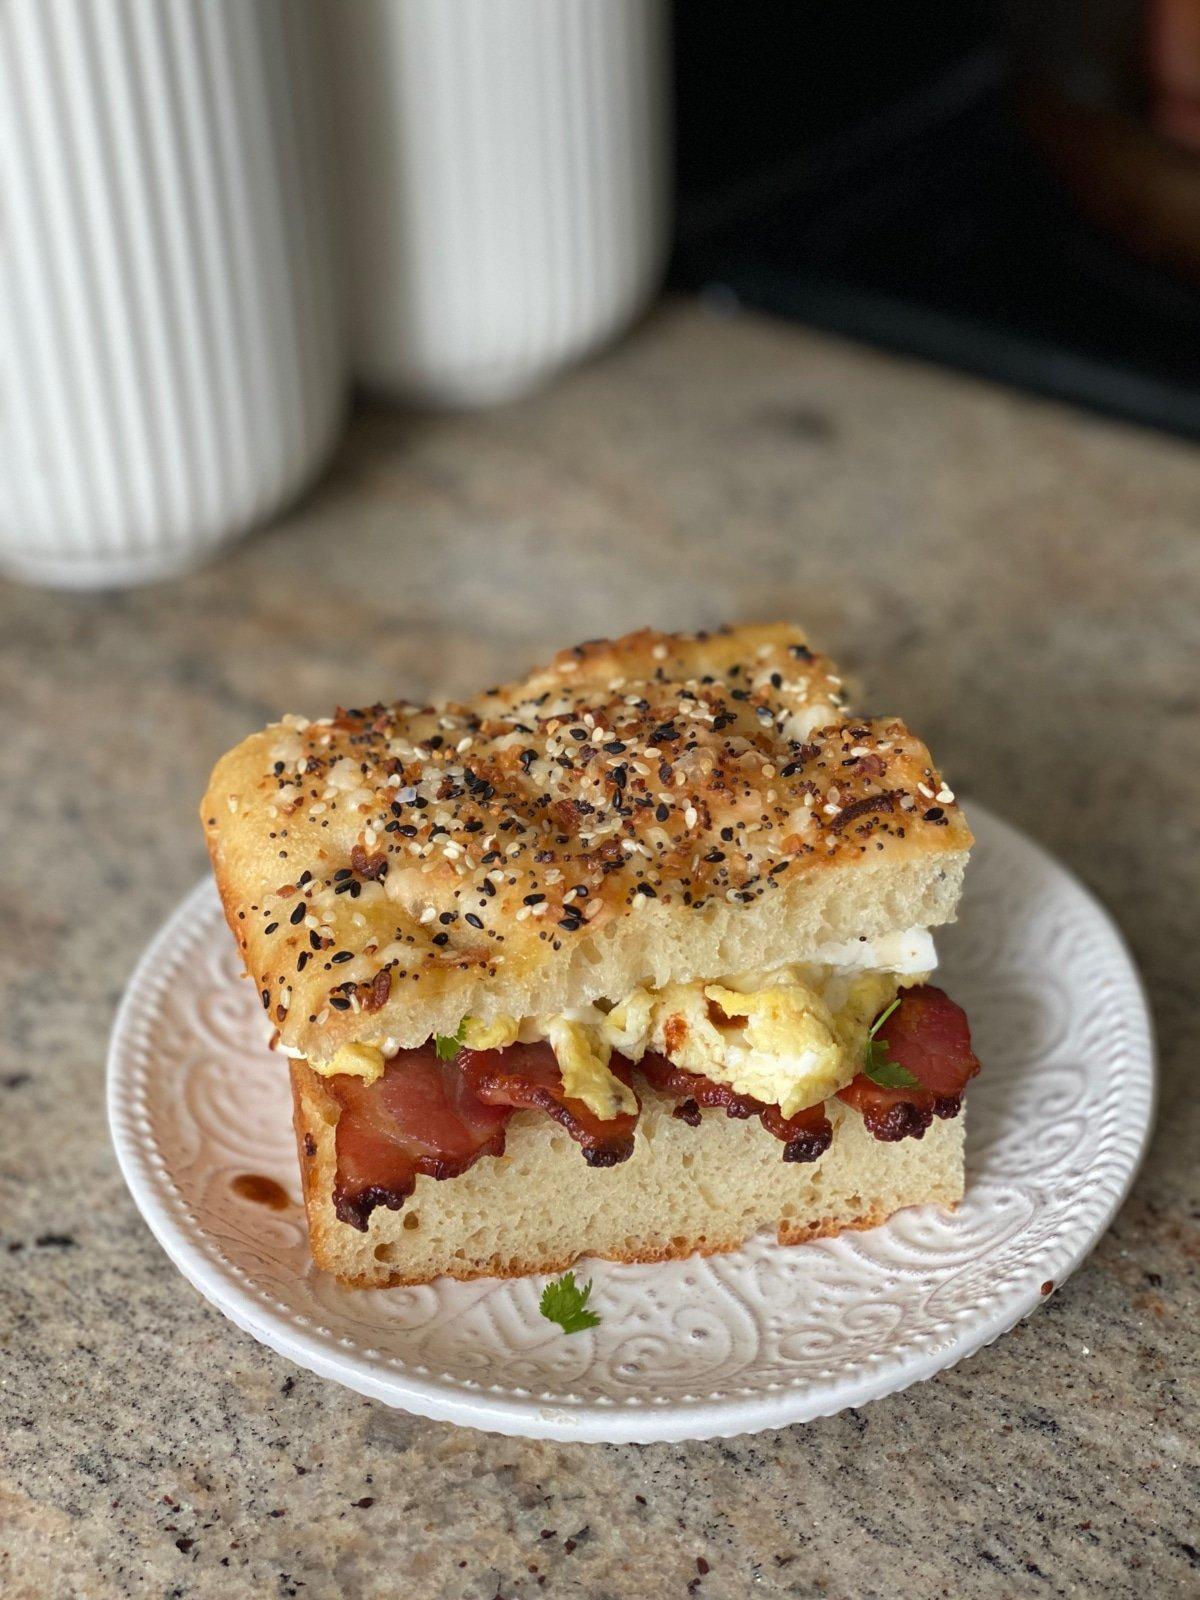 Gourmet bacon and egg sandwich on focaccia